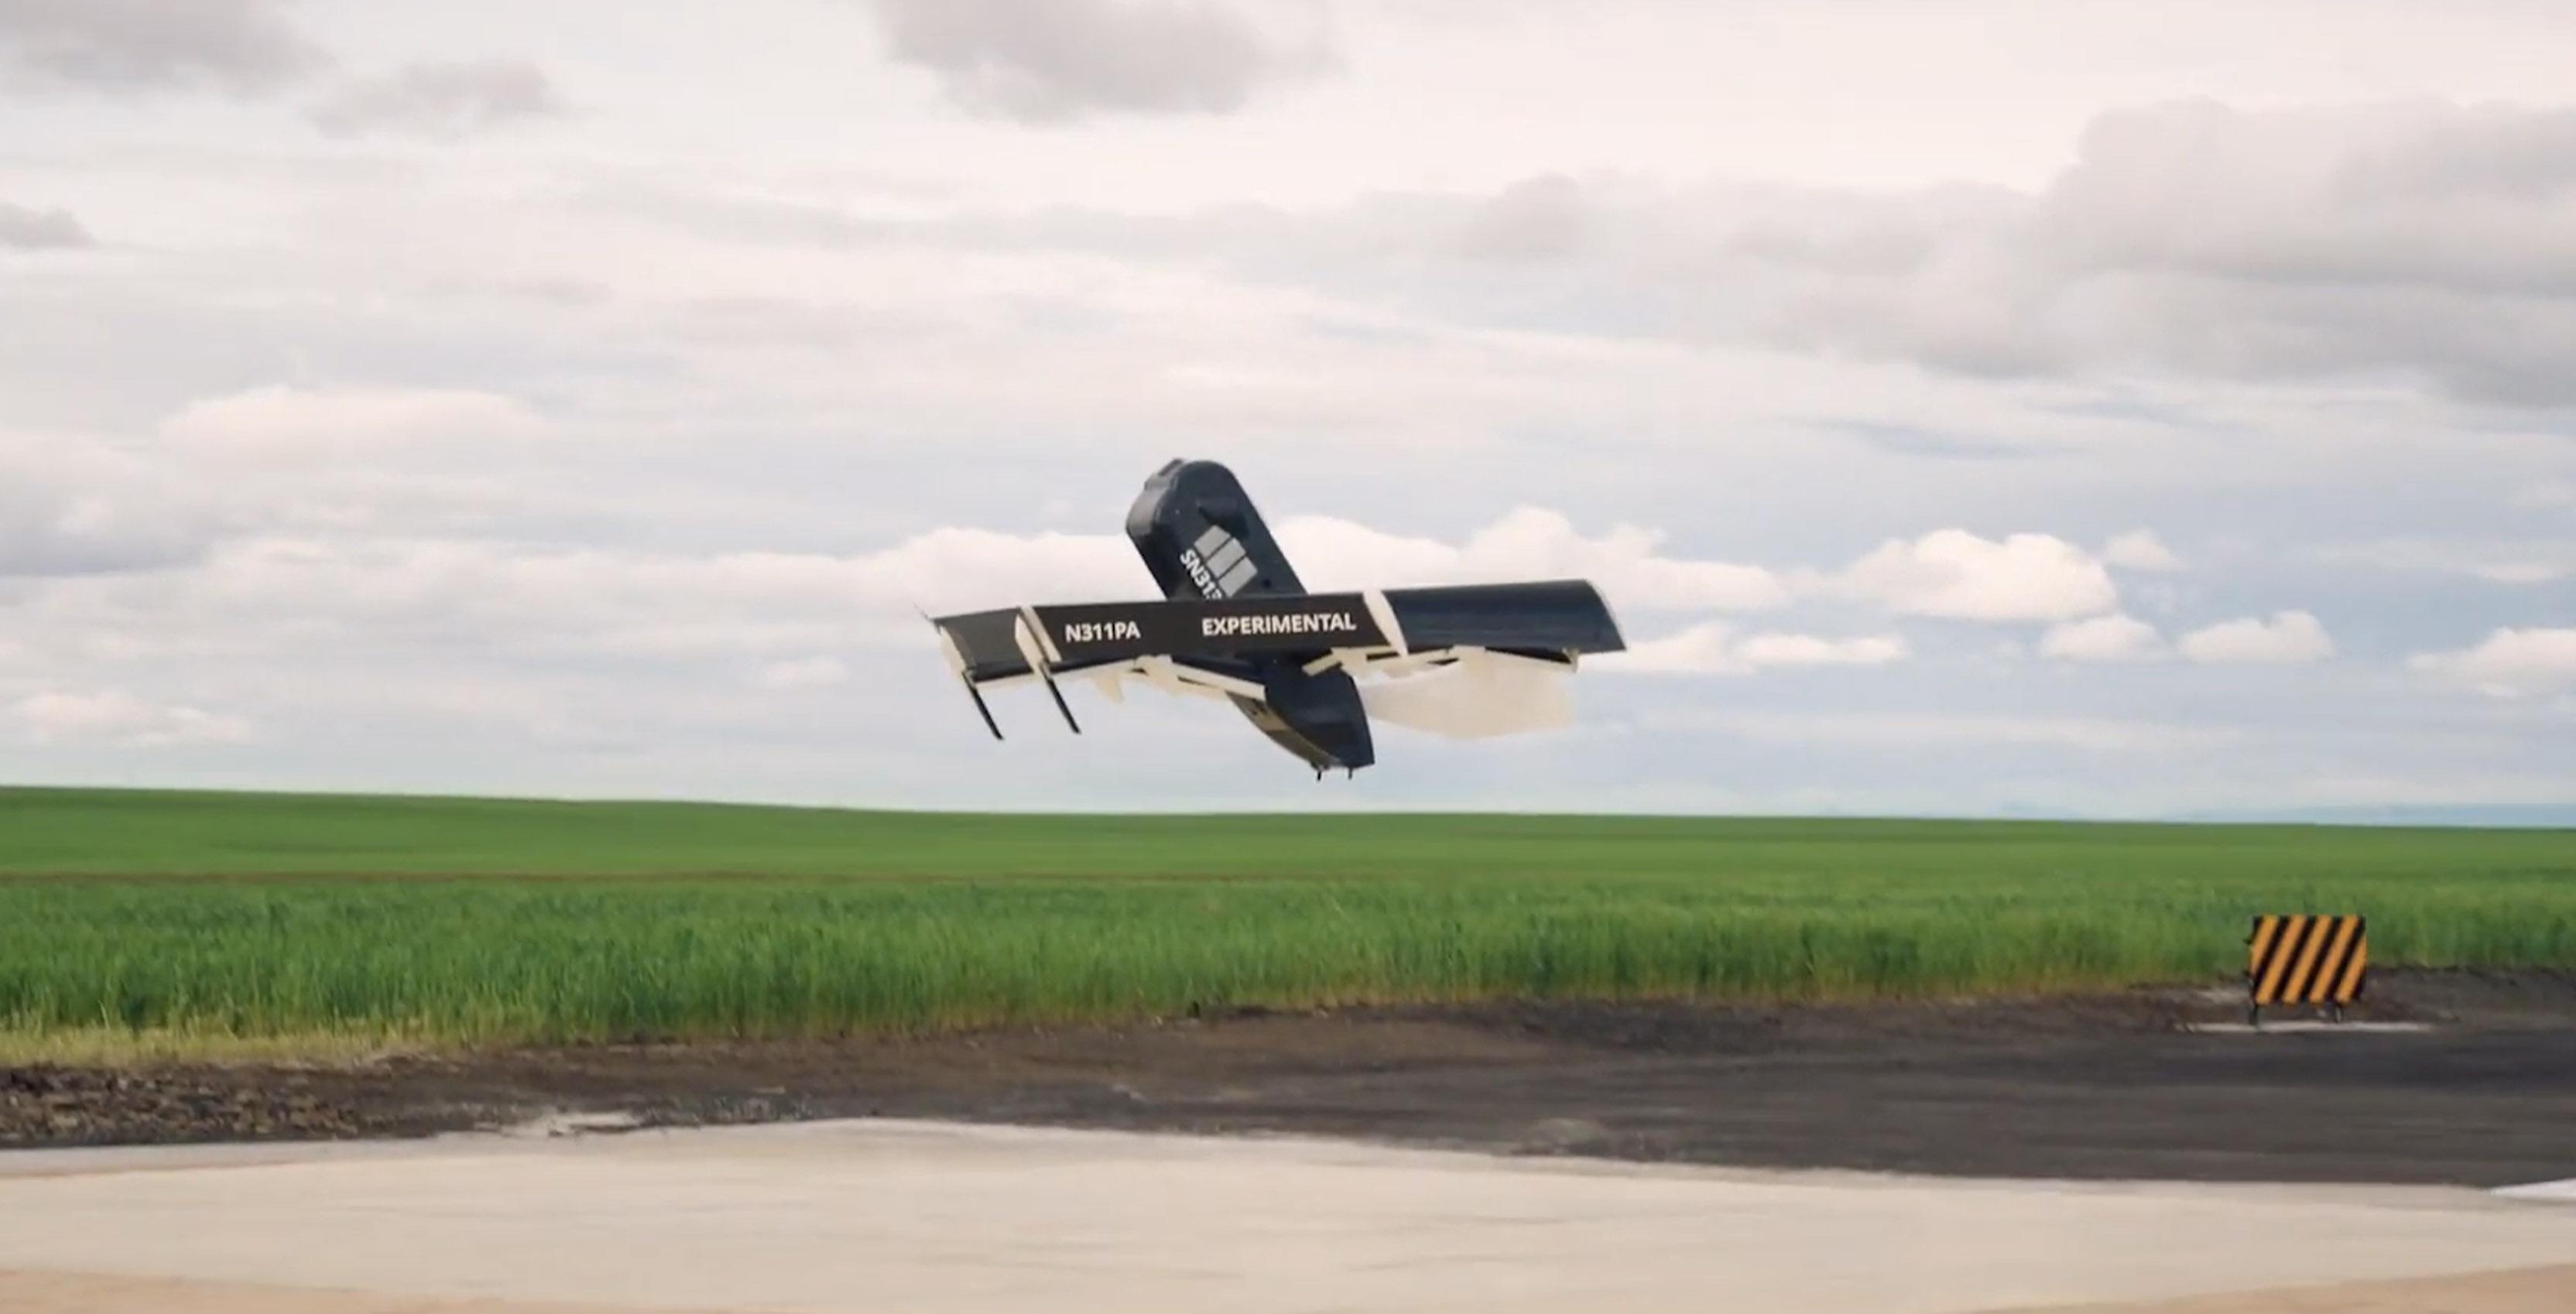 Amazon Prime Air delivery drone